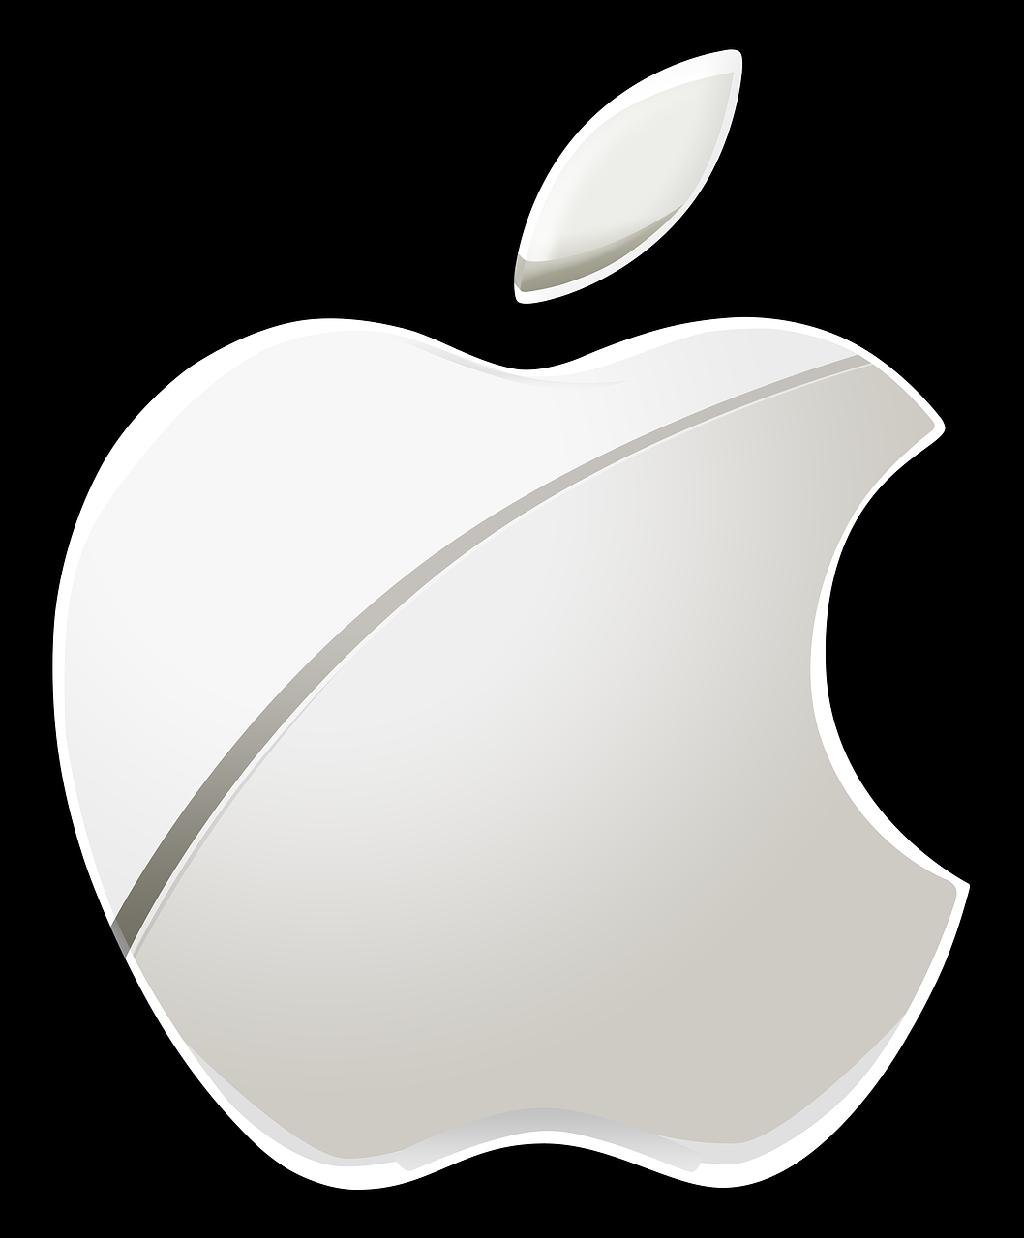 Apple Ios Logo PNG - 31892